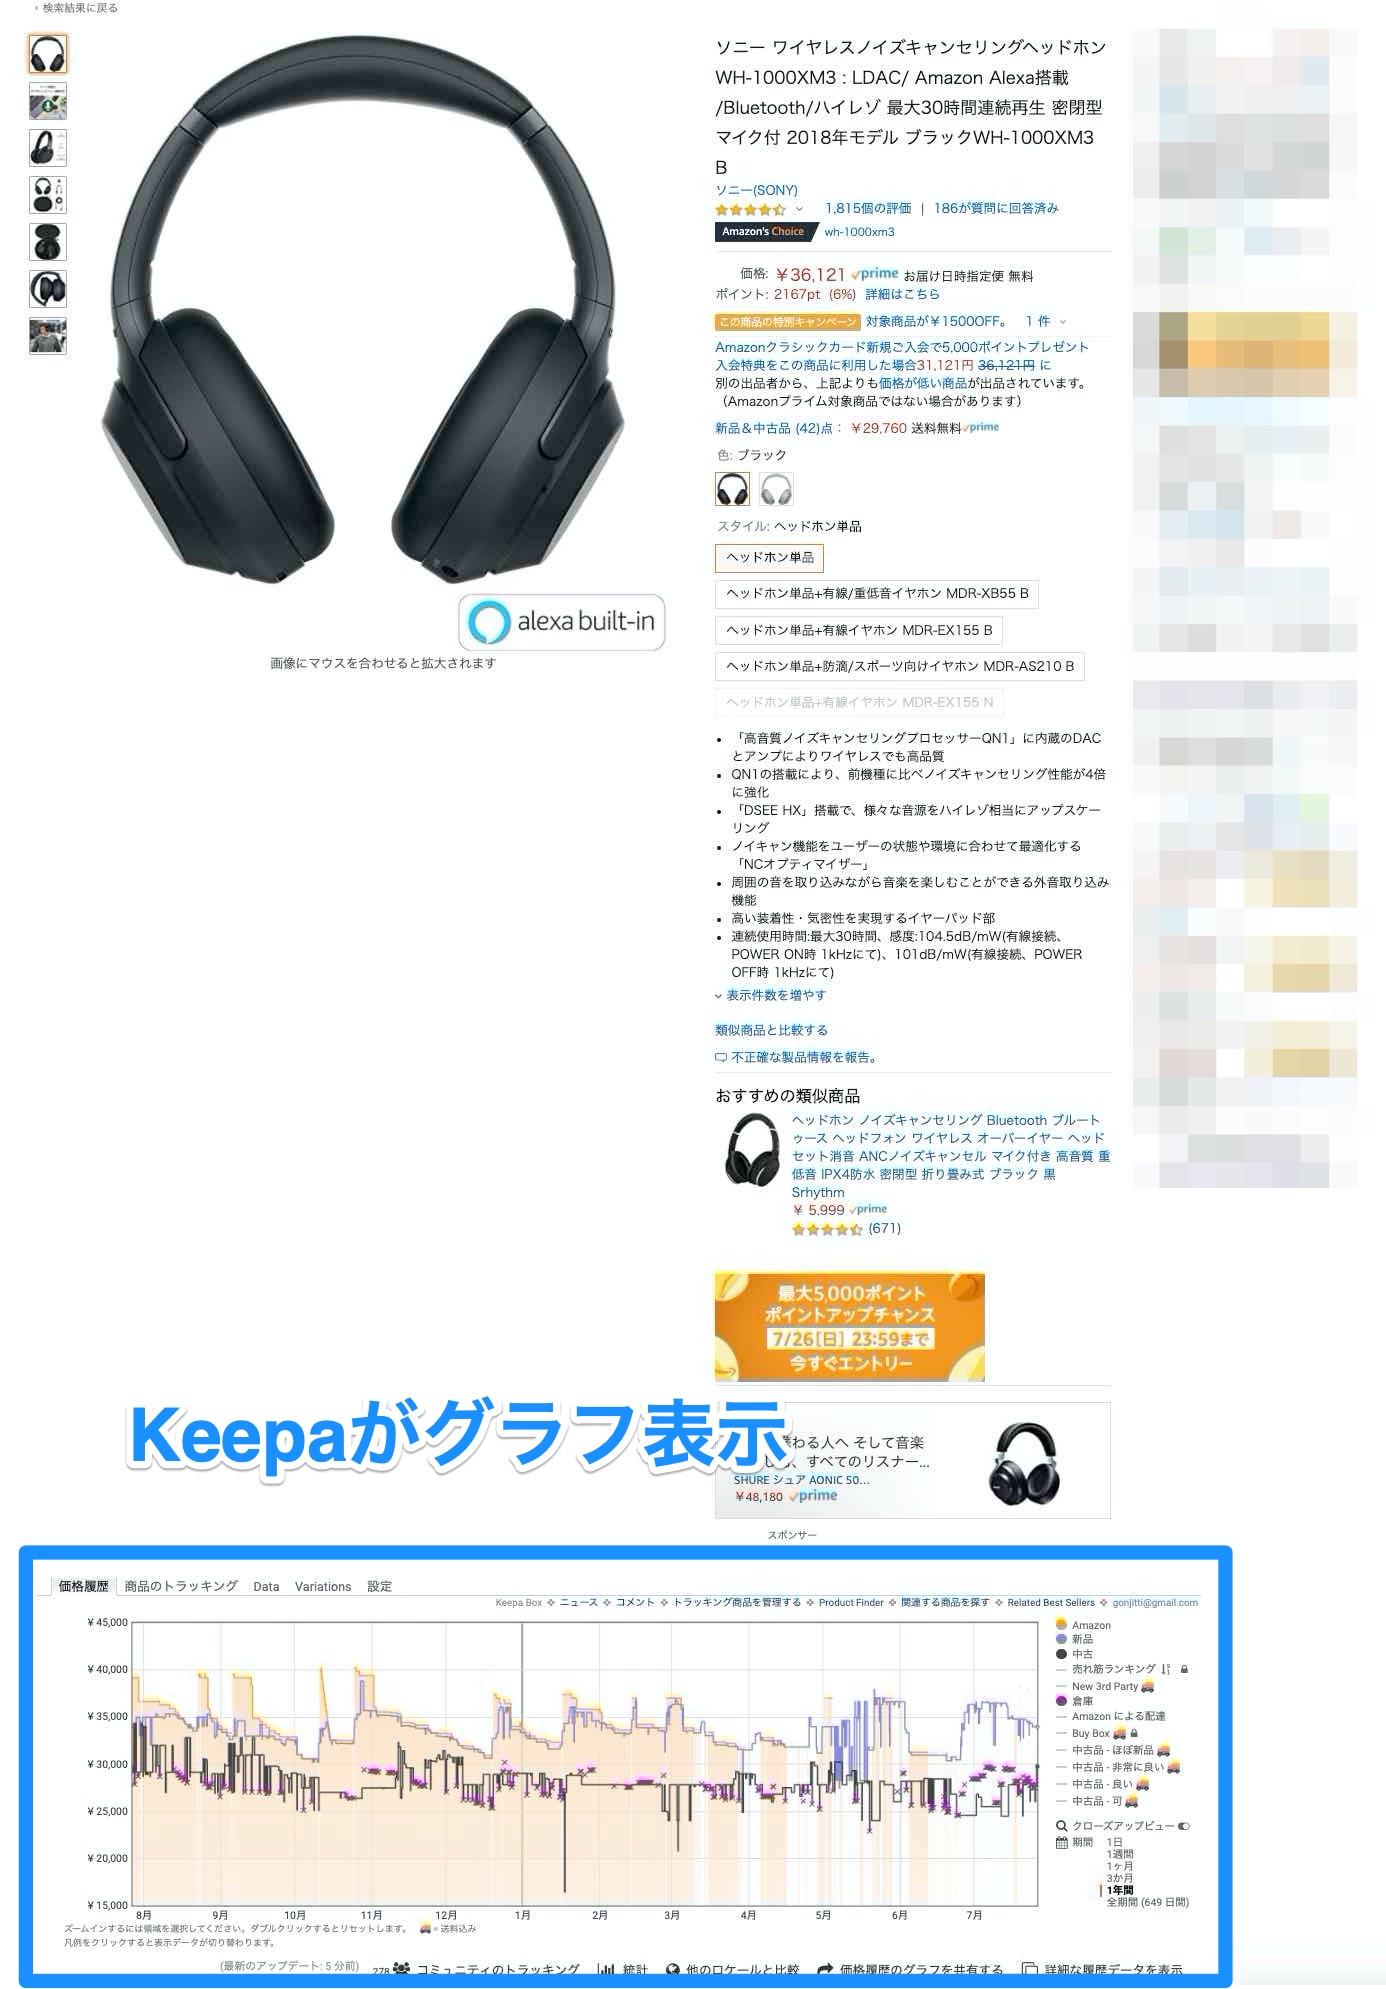 headphone-image